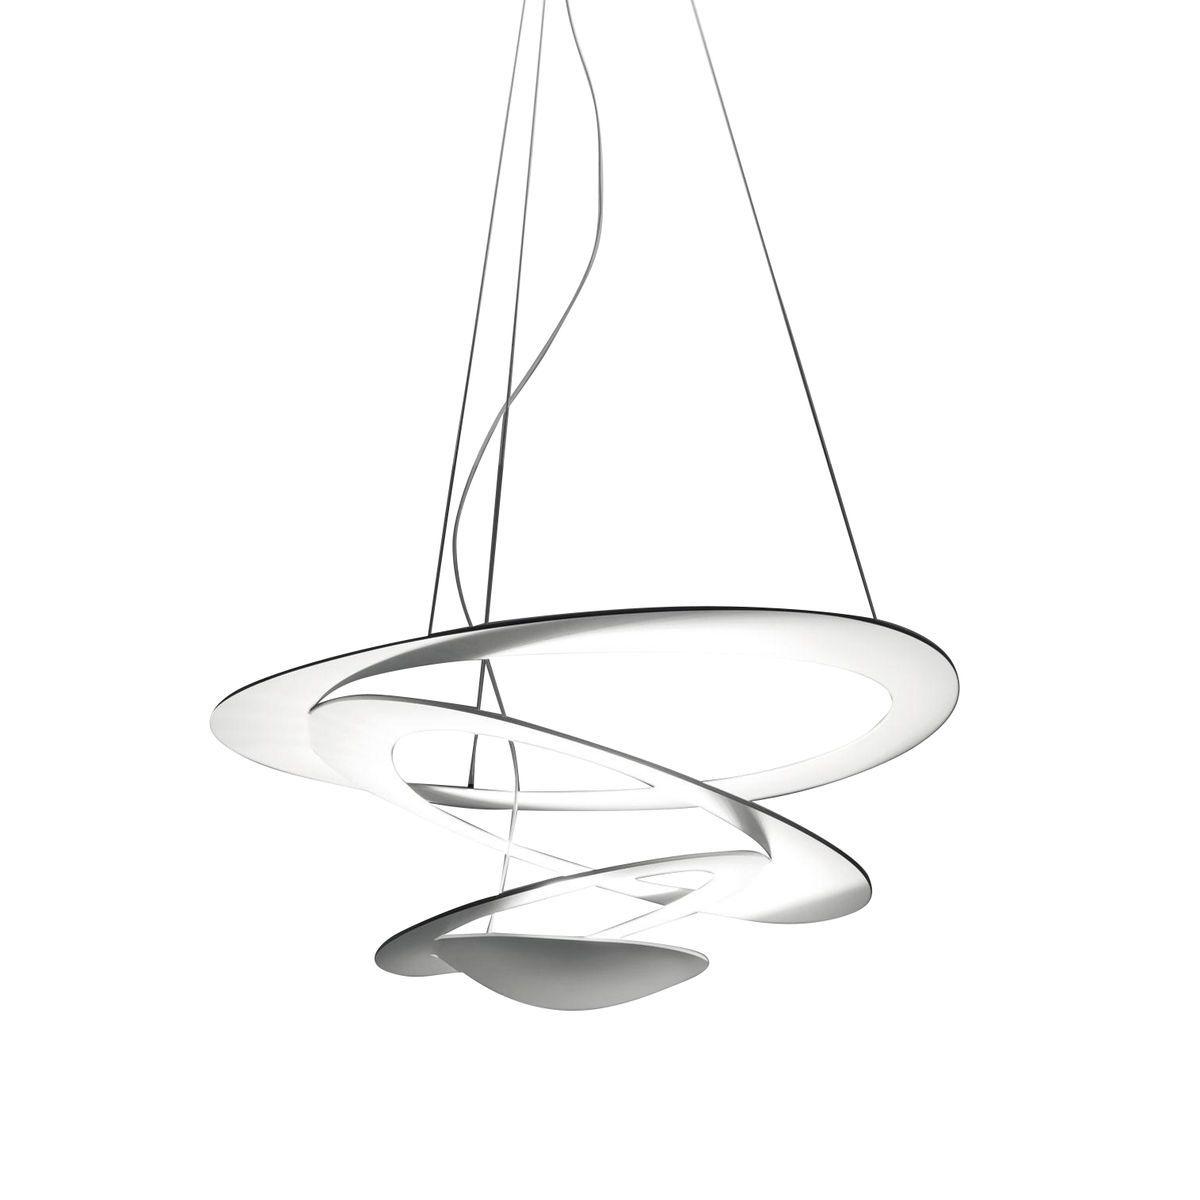 pirce mini suspension lamp  artemide  ambientedirectcom - artemide  pirce mini pendelleuchte  weißmattkwattlxbxhxxcm